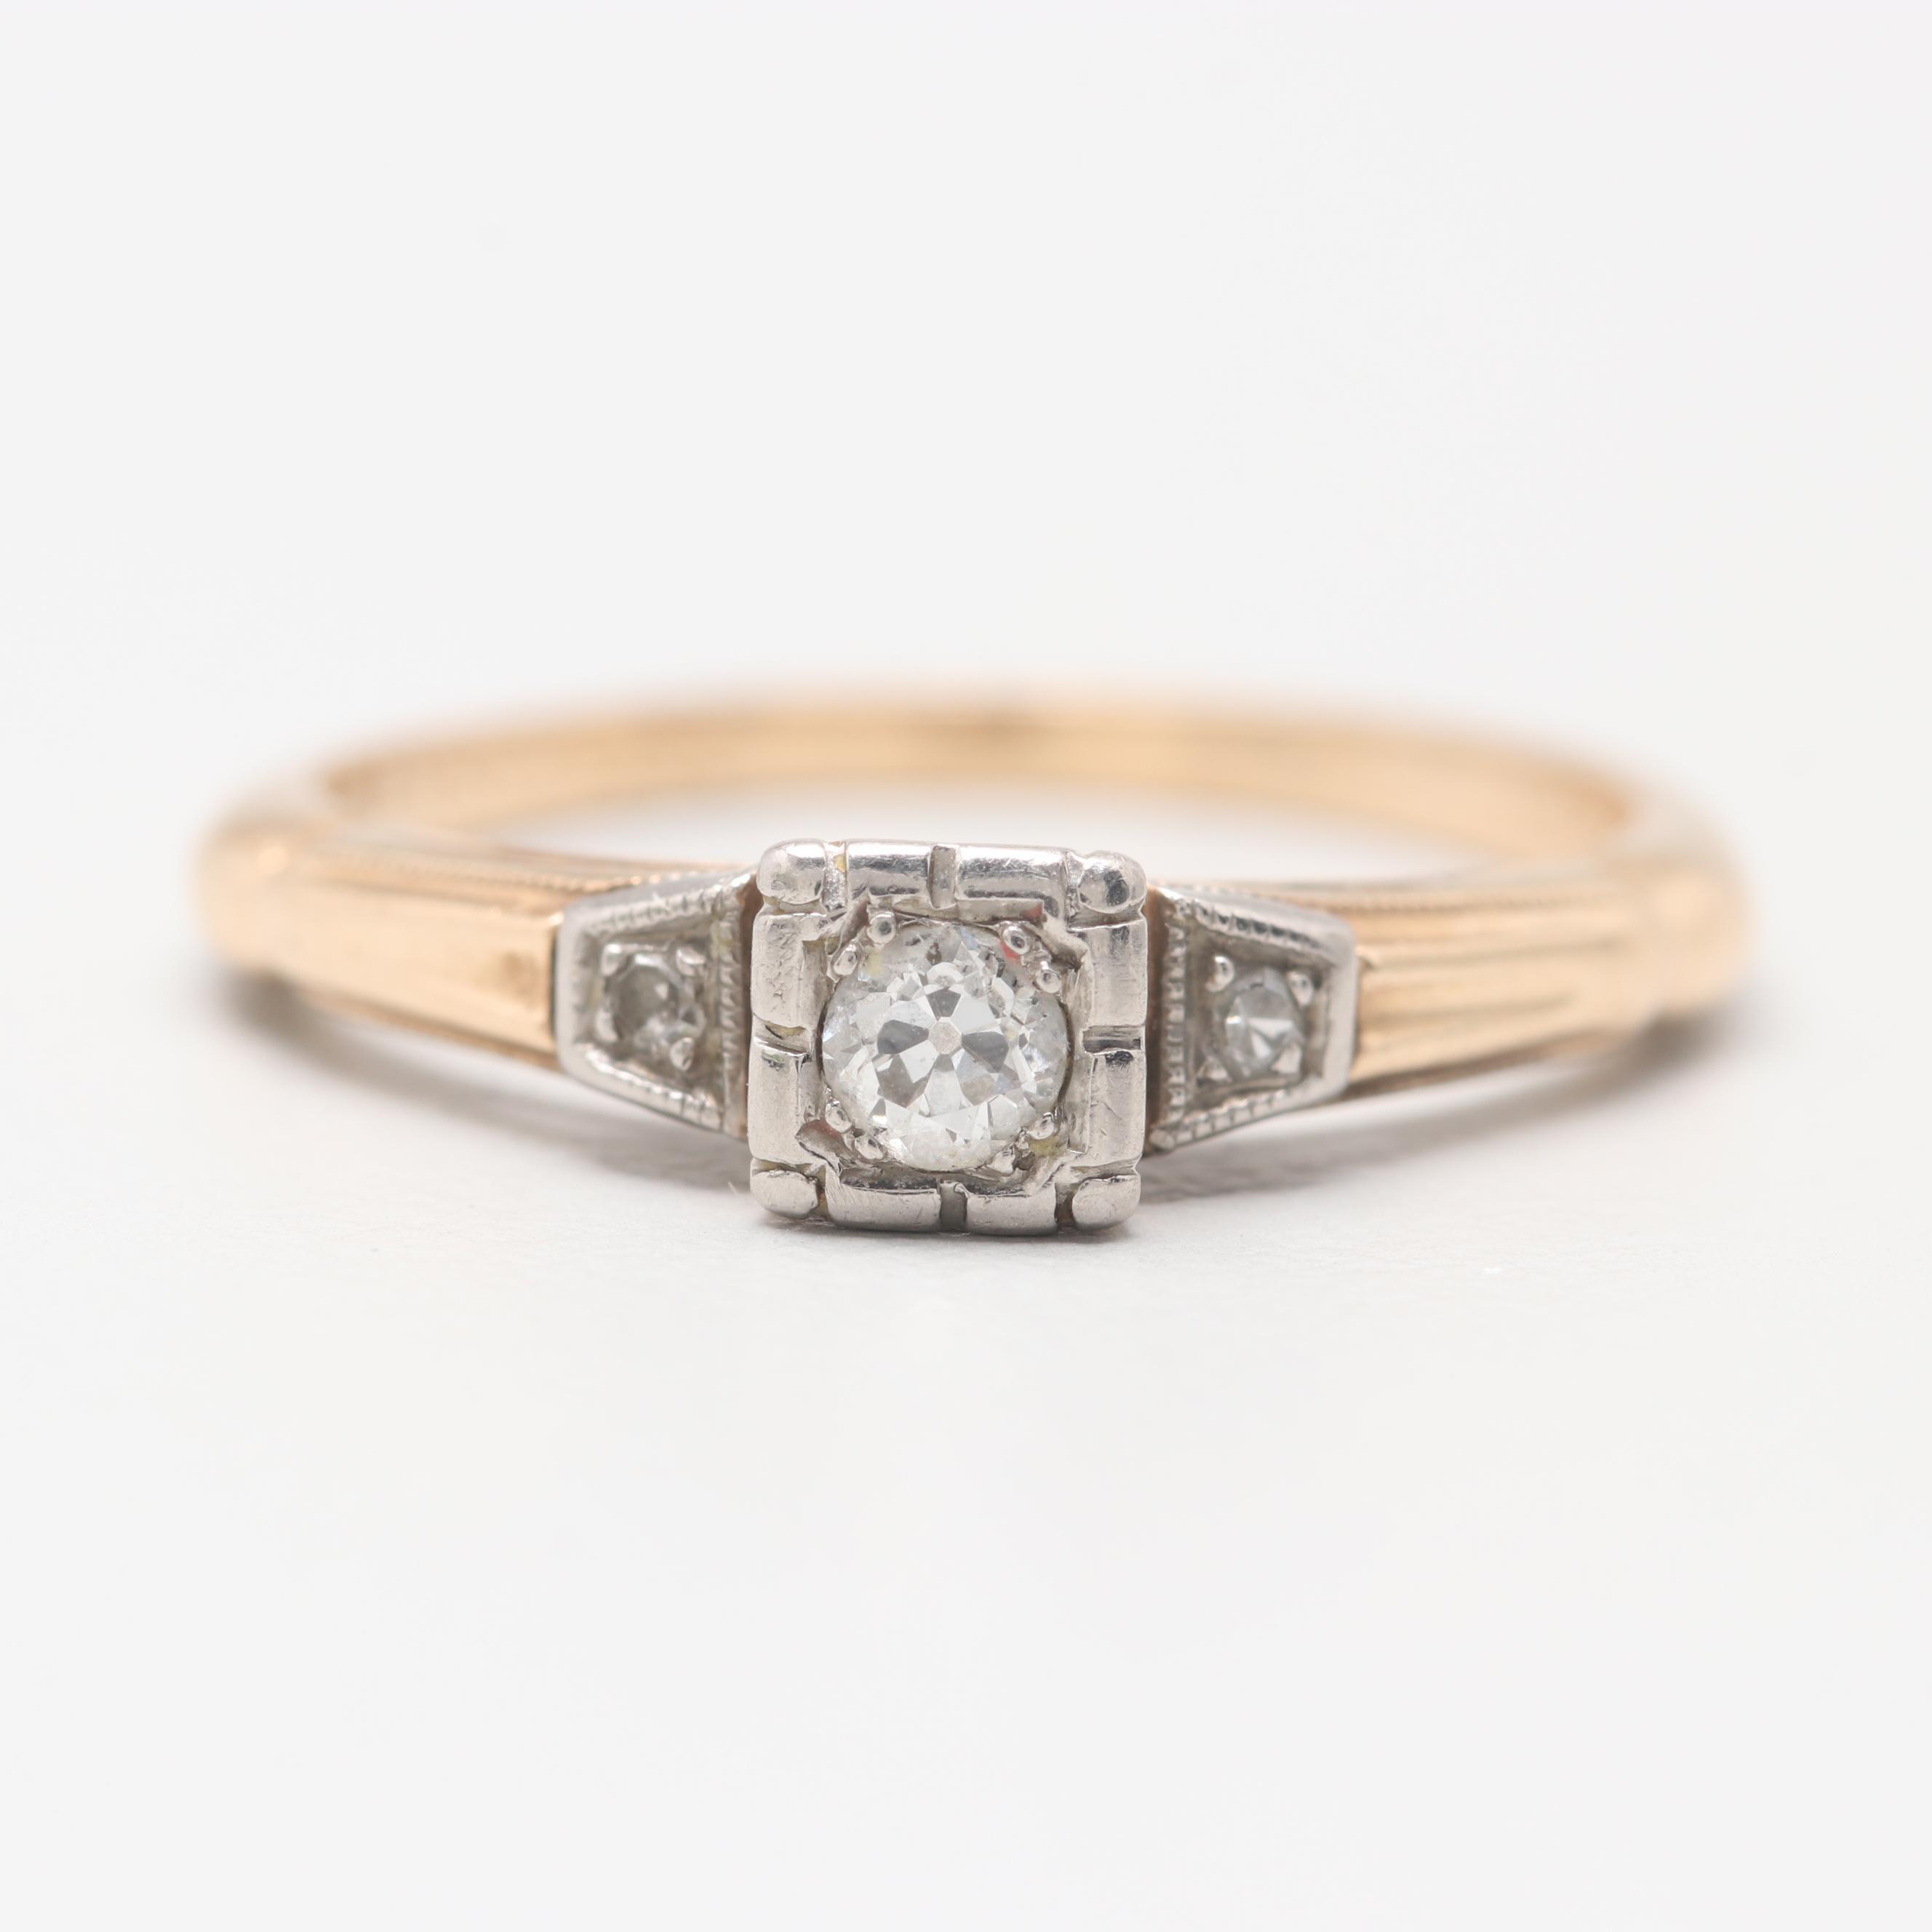 14K Yellow Gold Diamond Ring with Palladium Accent